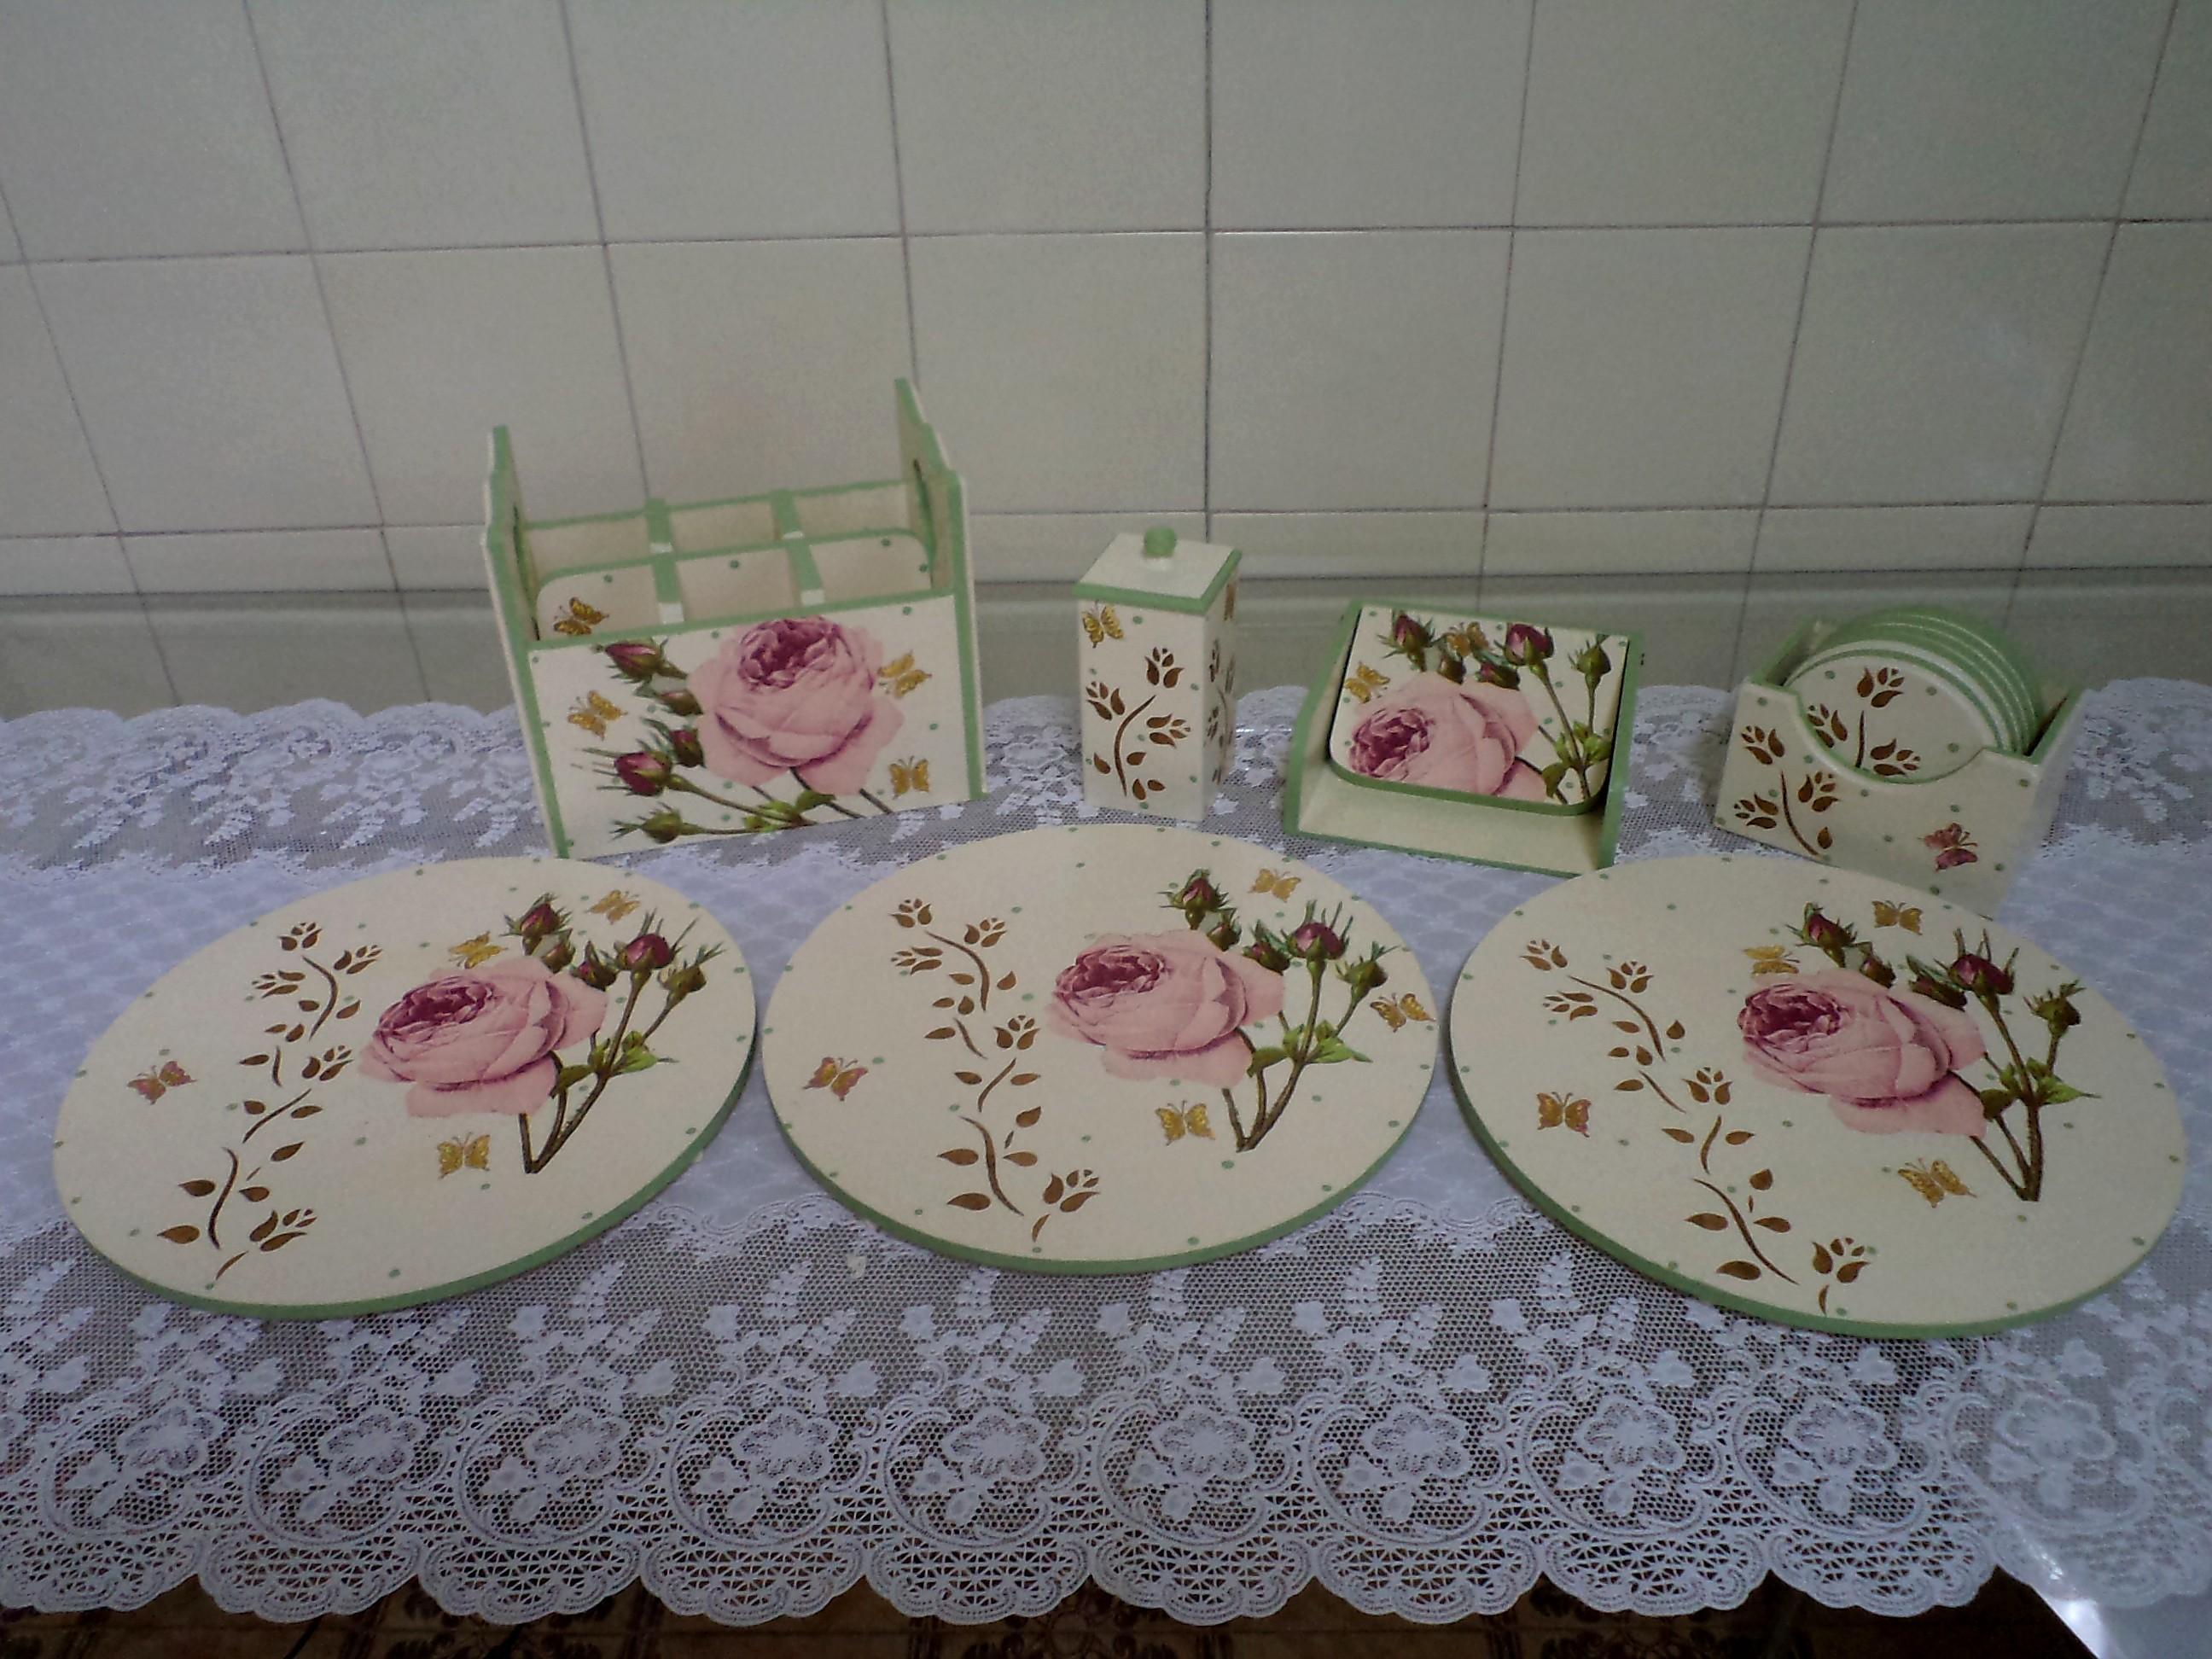 mdf cozinha churrasco mdf kit mdf cozinha churrasco kit cozinha mdf #66433E 2592x1944